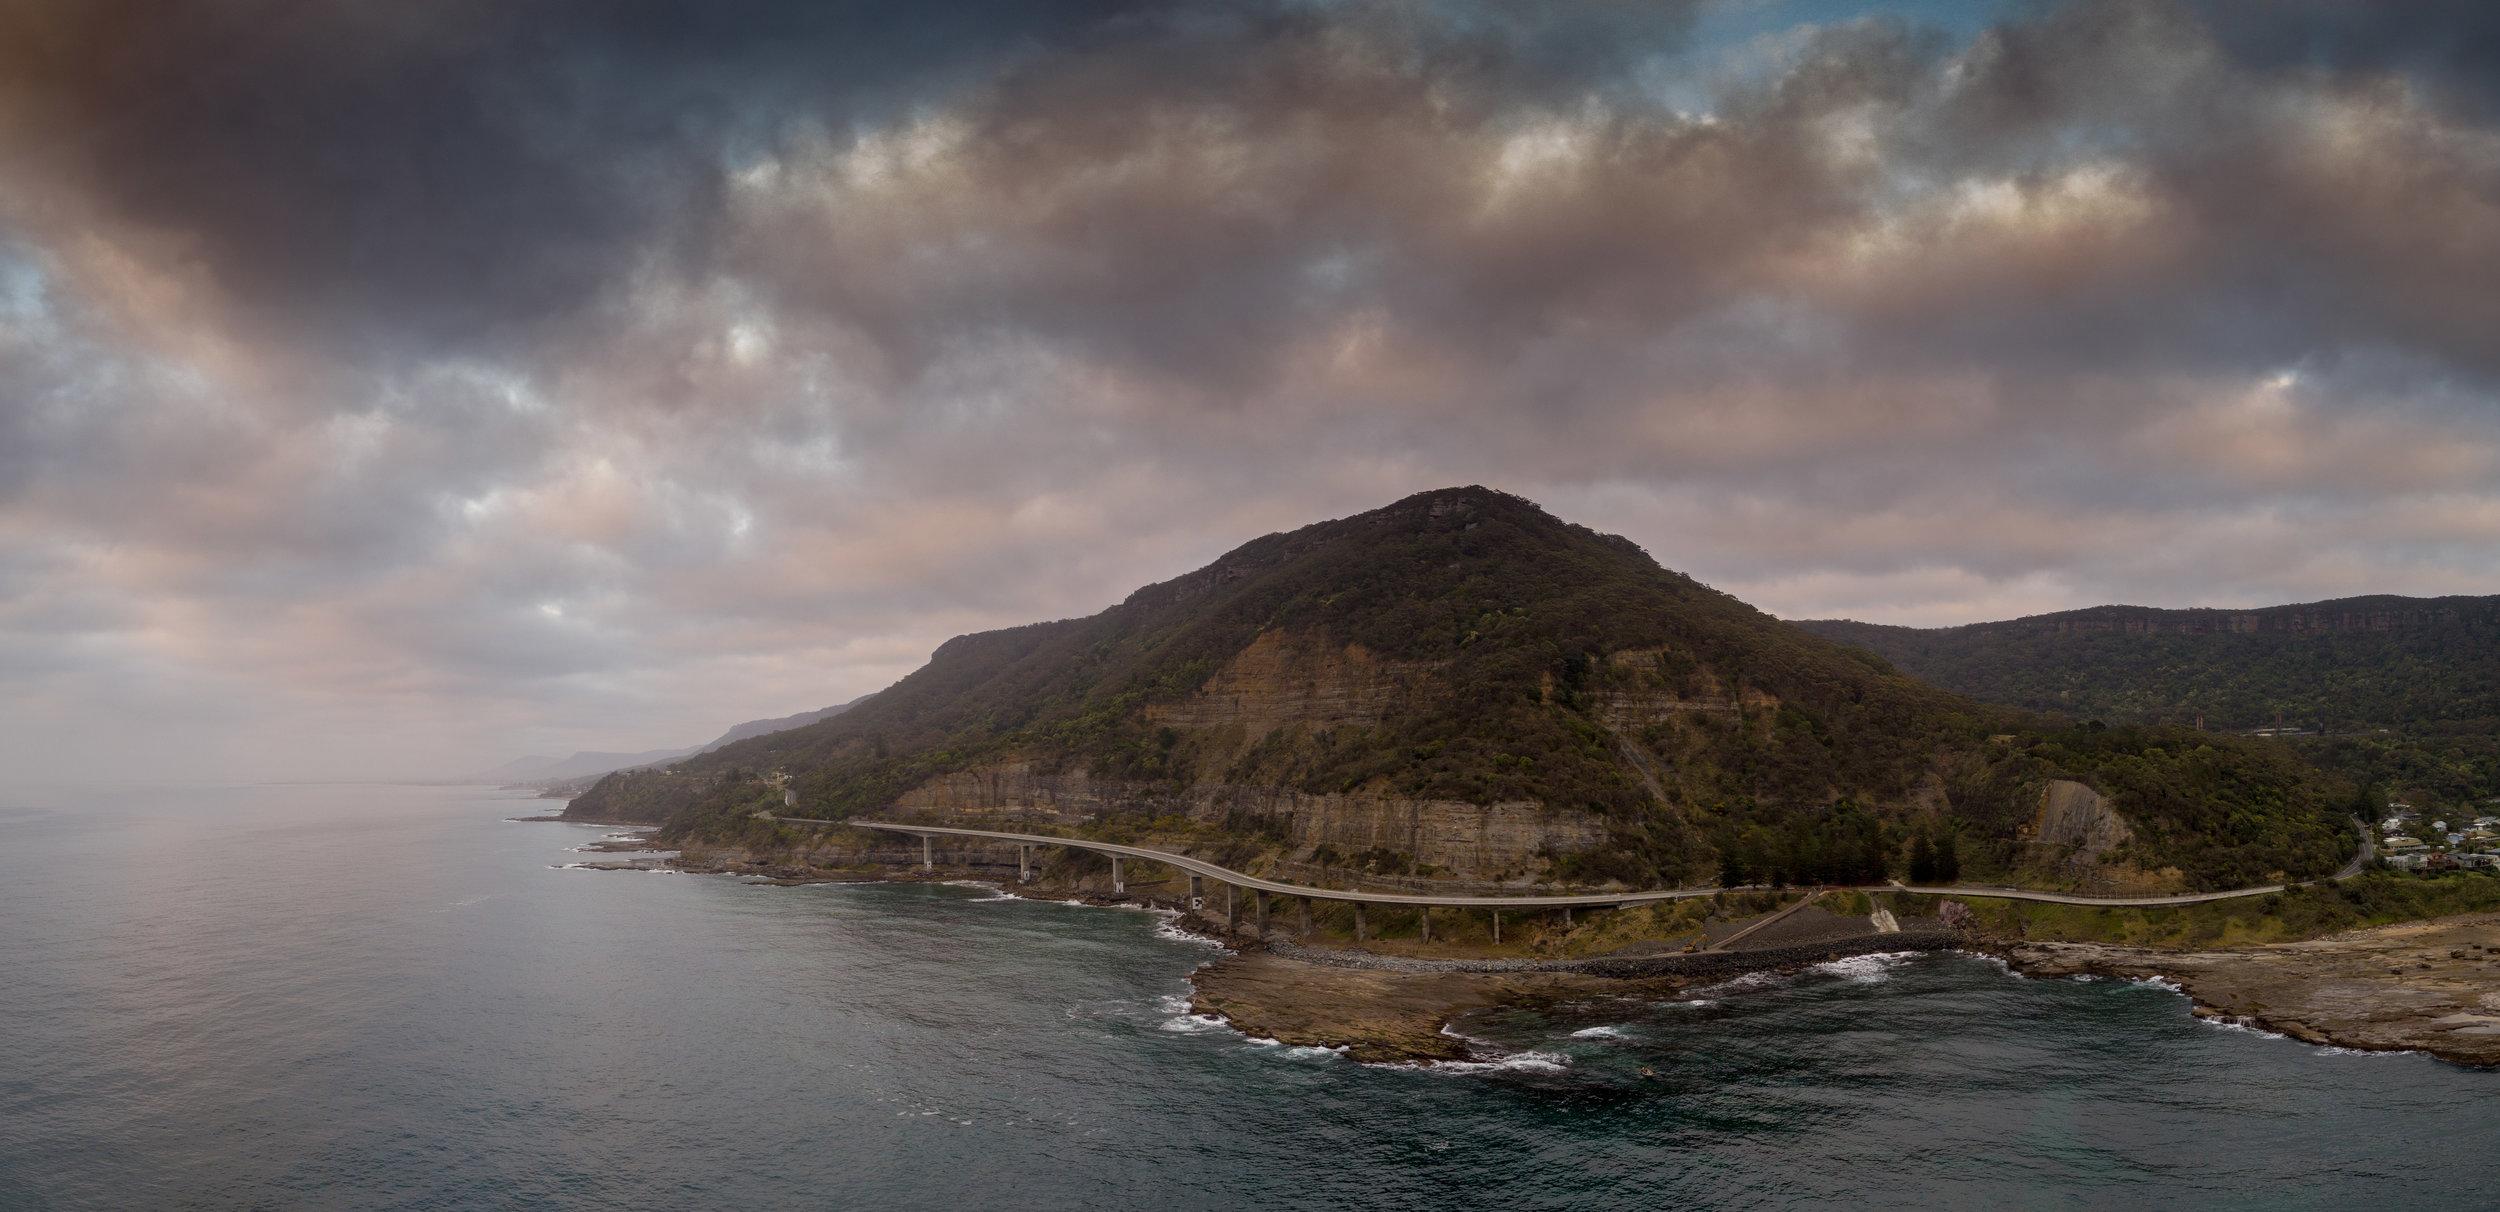 Seacliff Bridge 2 lores.jpg